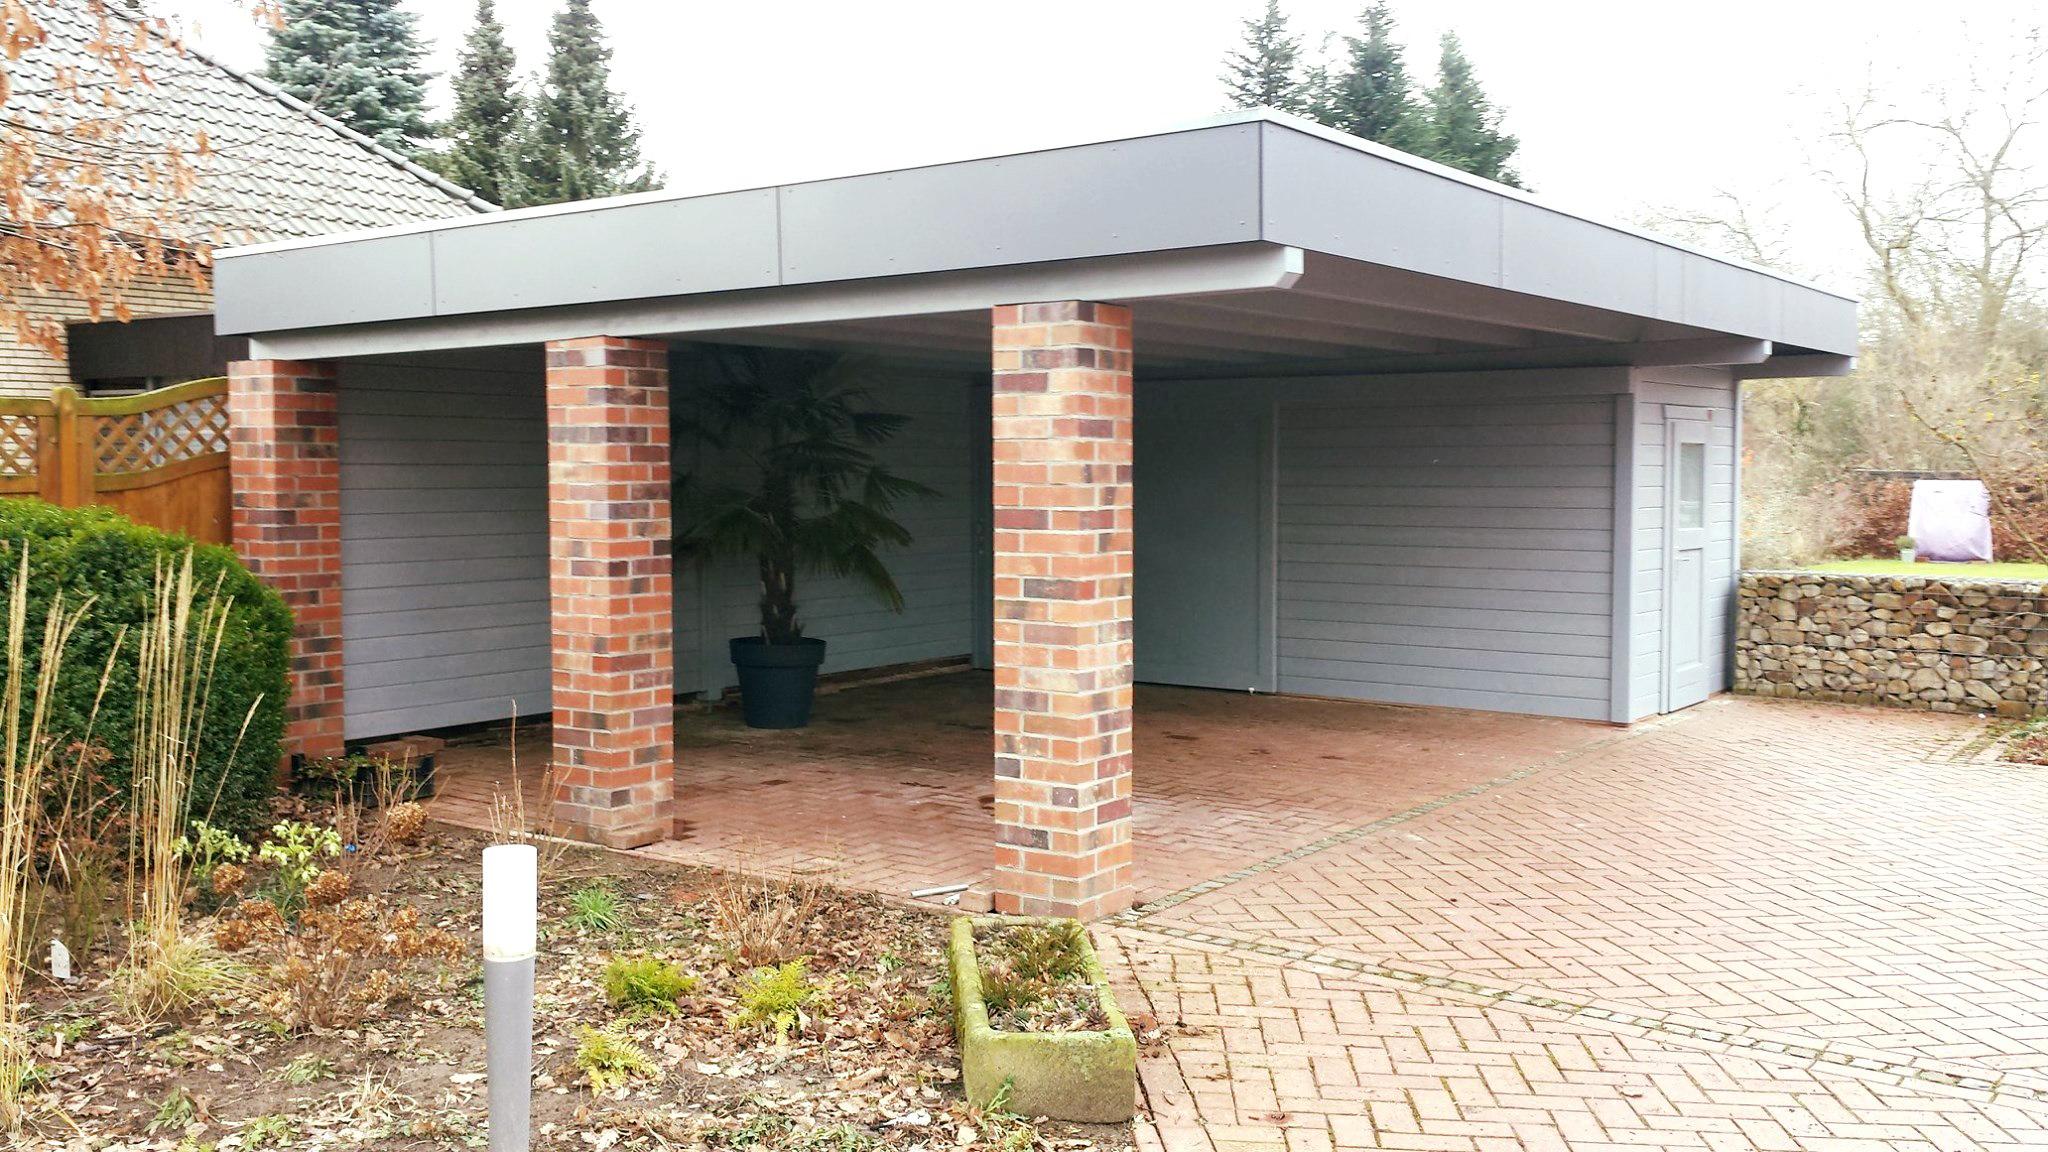 Doppel-Carport, Abstellraum, Trespa